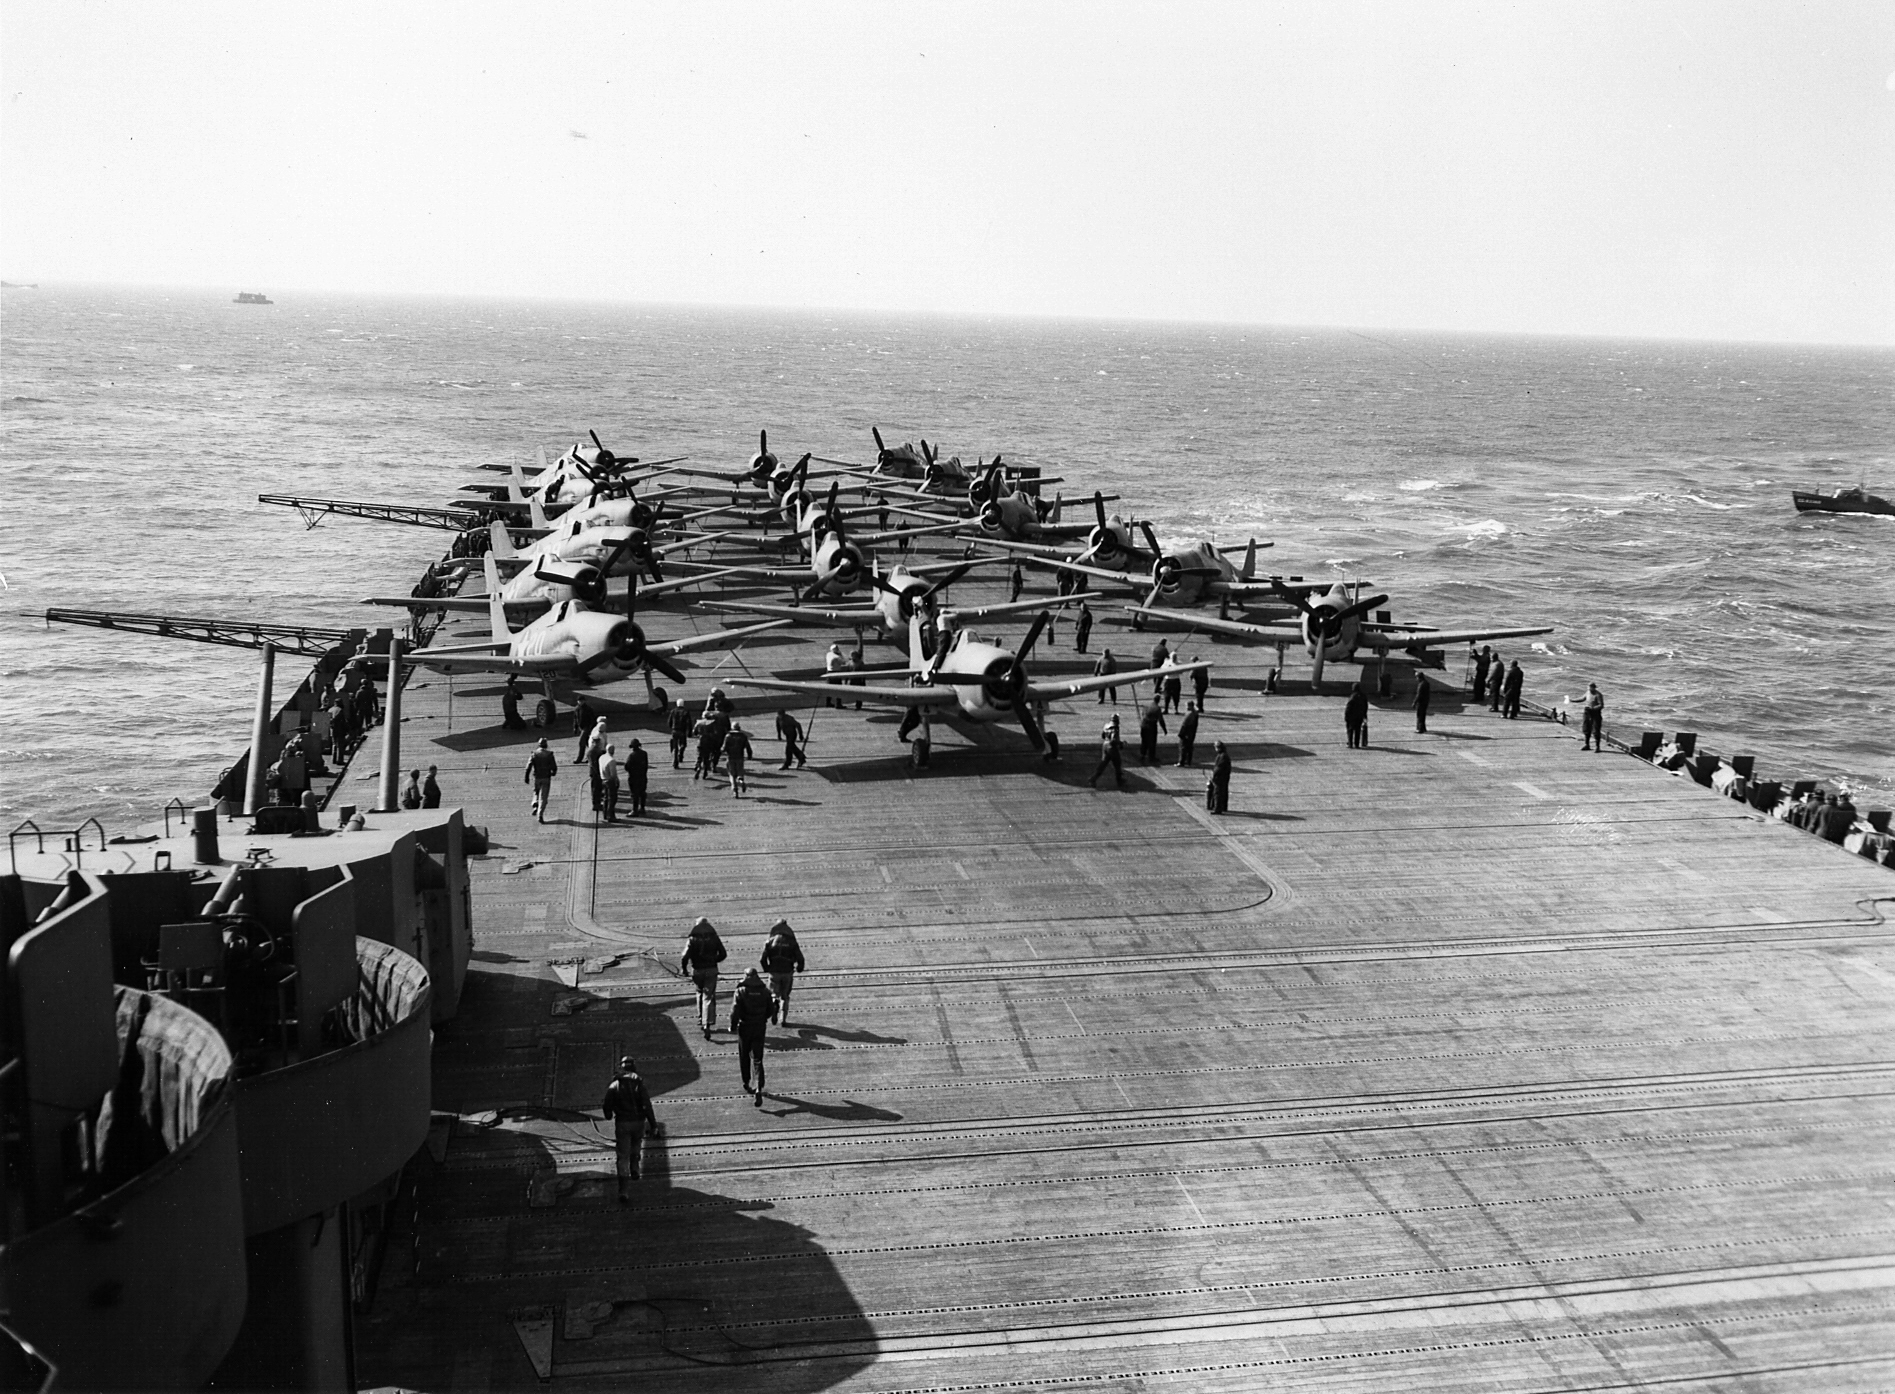 Grumman F6F 3 Hellcat VF 9 White 20 landing aboard CV 9 USS Essex 1943 01